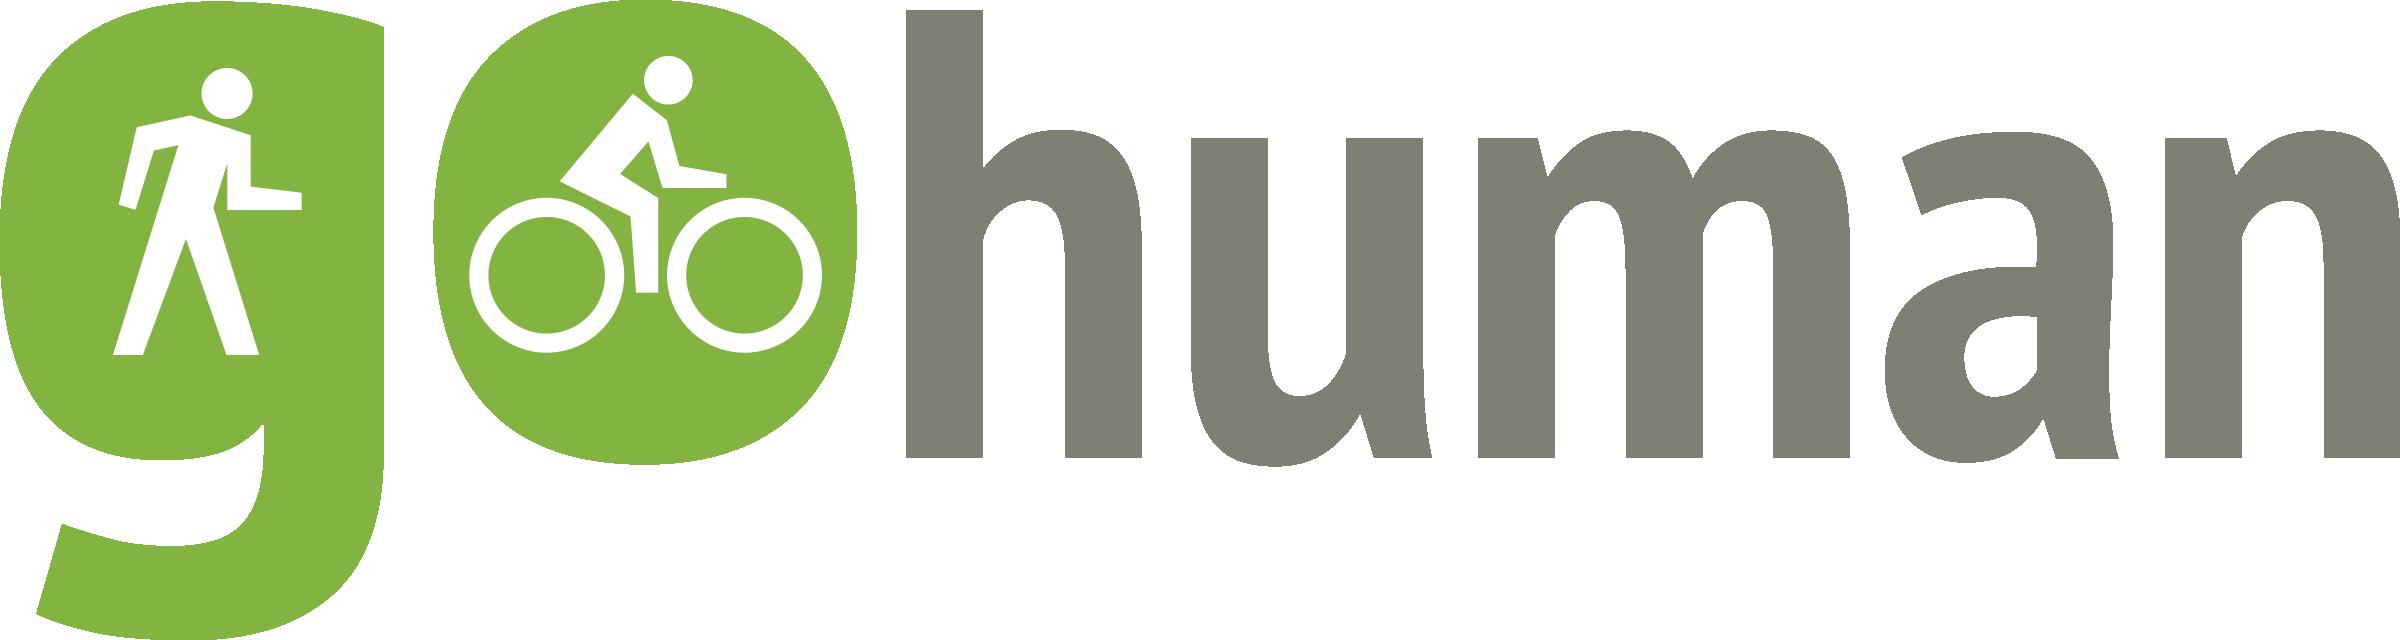 Go Human